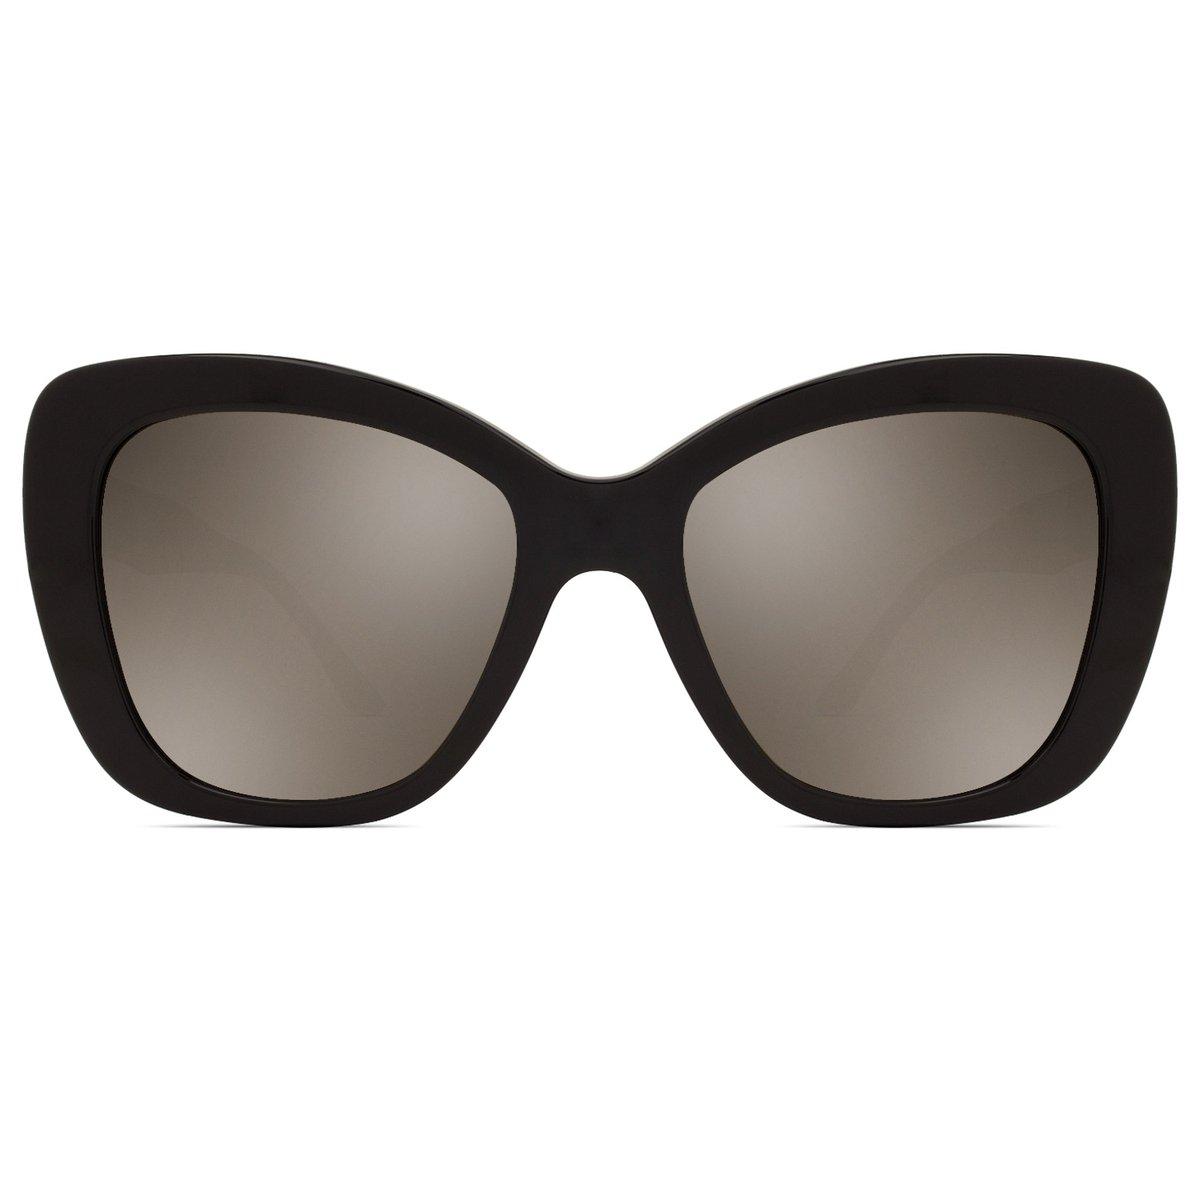 Óculos de Sol Versace VE4305Q GB1 5A-54 - Compre Agora   Zattini f7895875e6